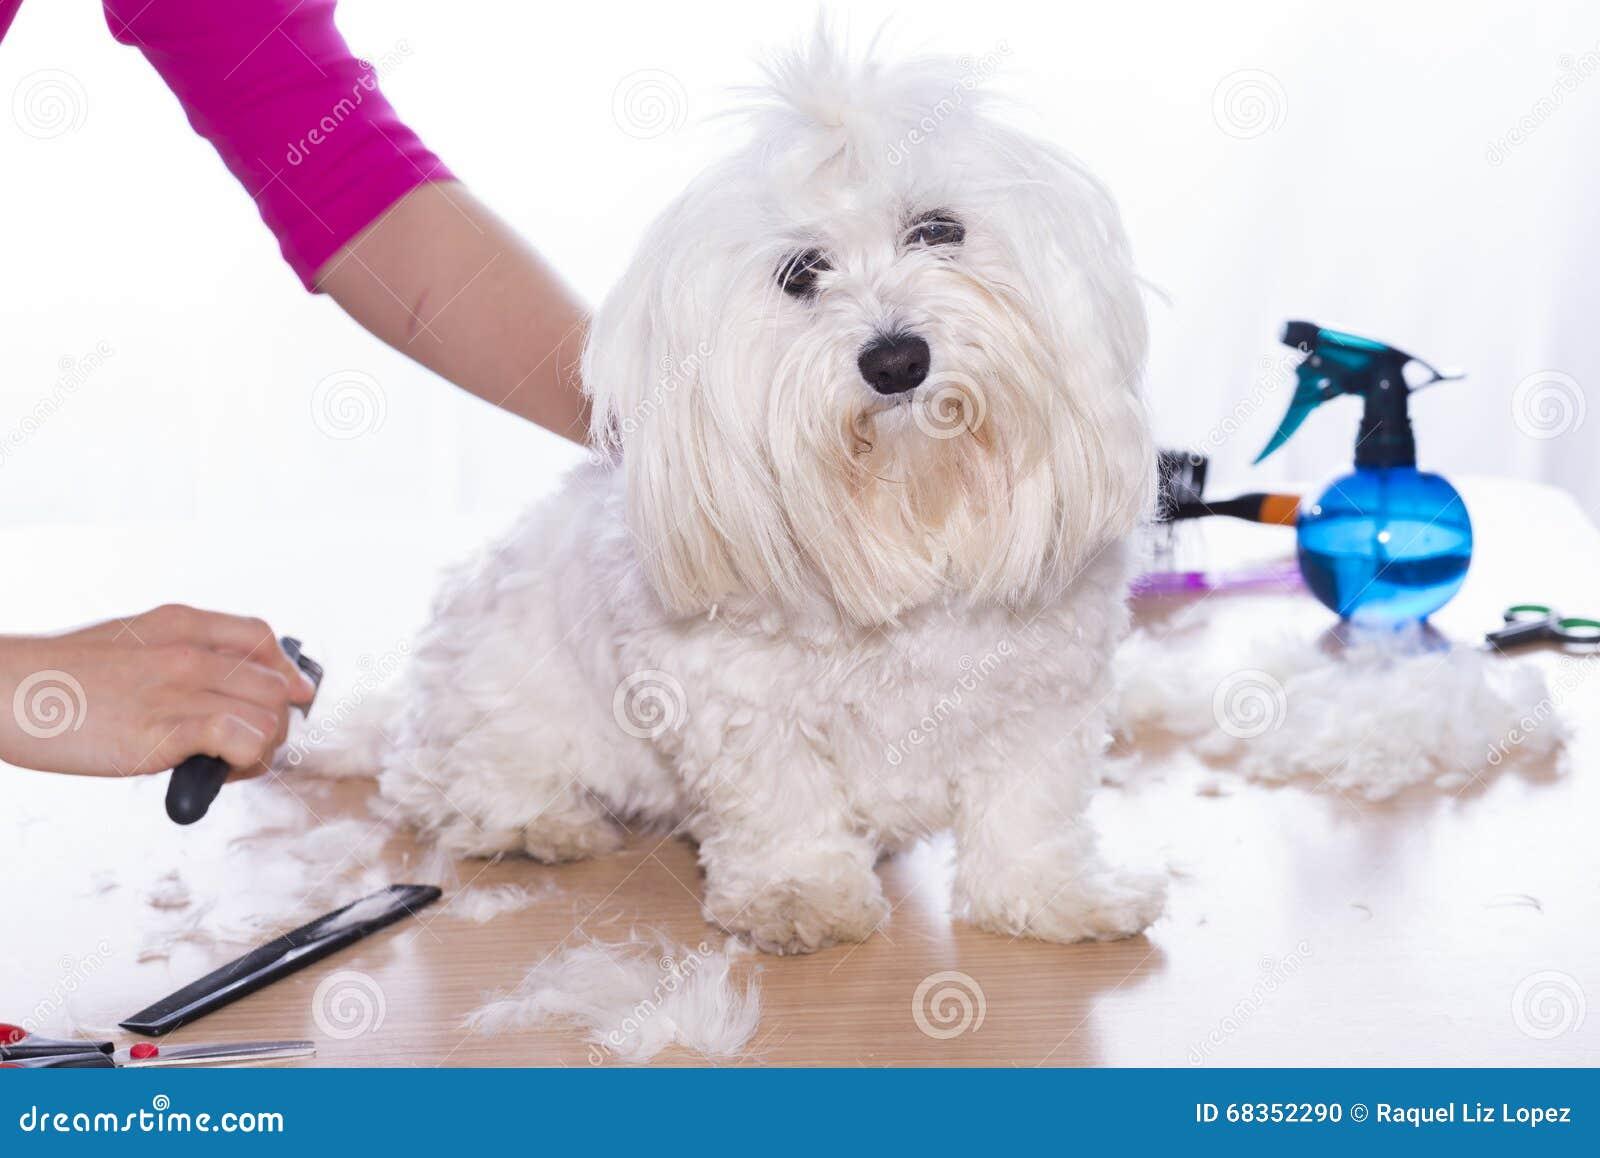 Corte canino do cabelo